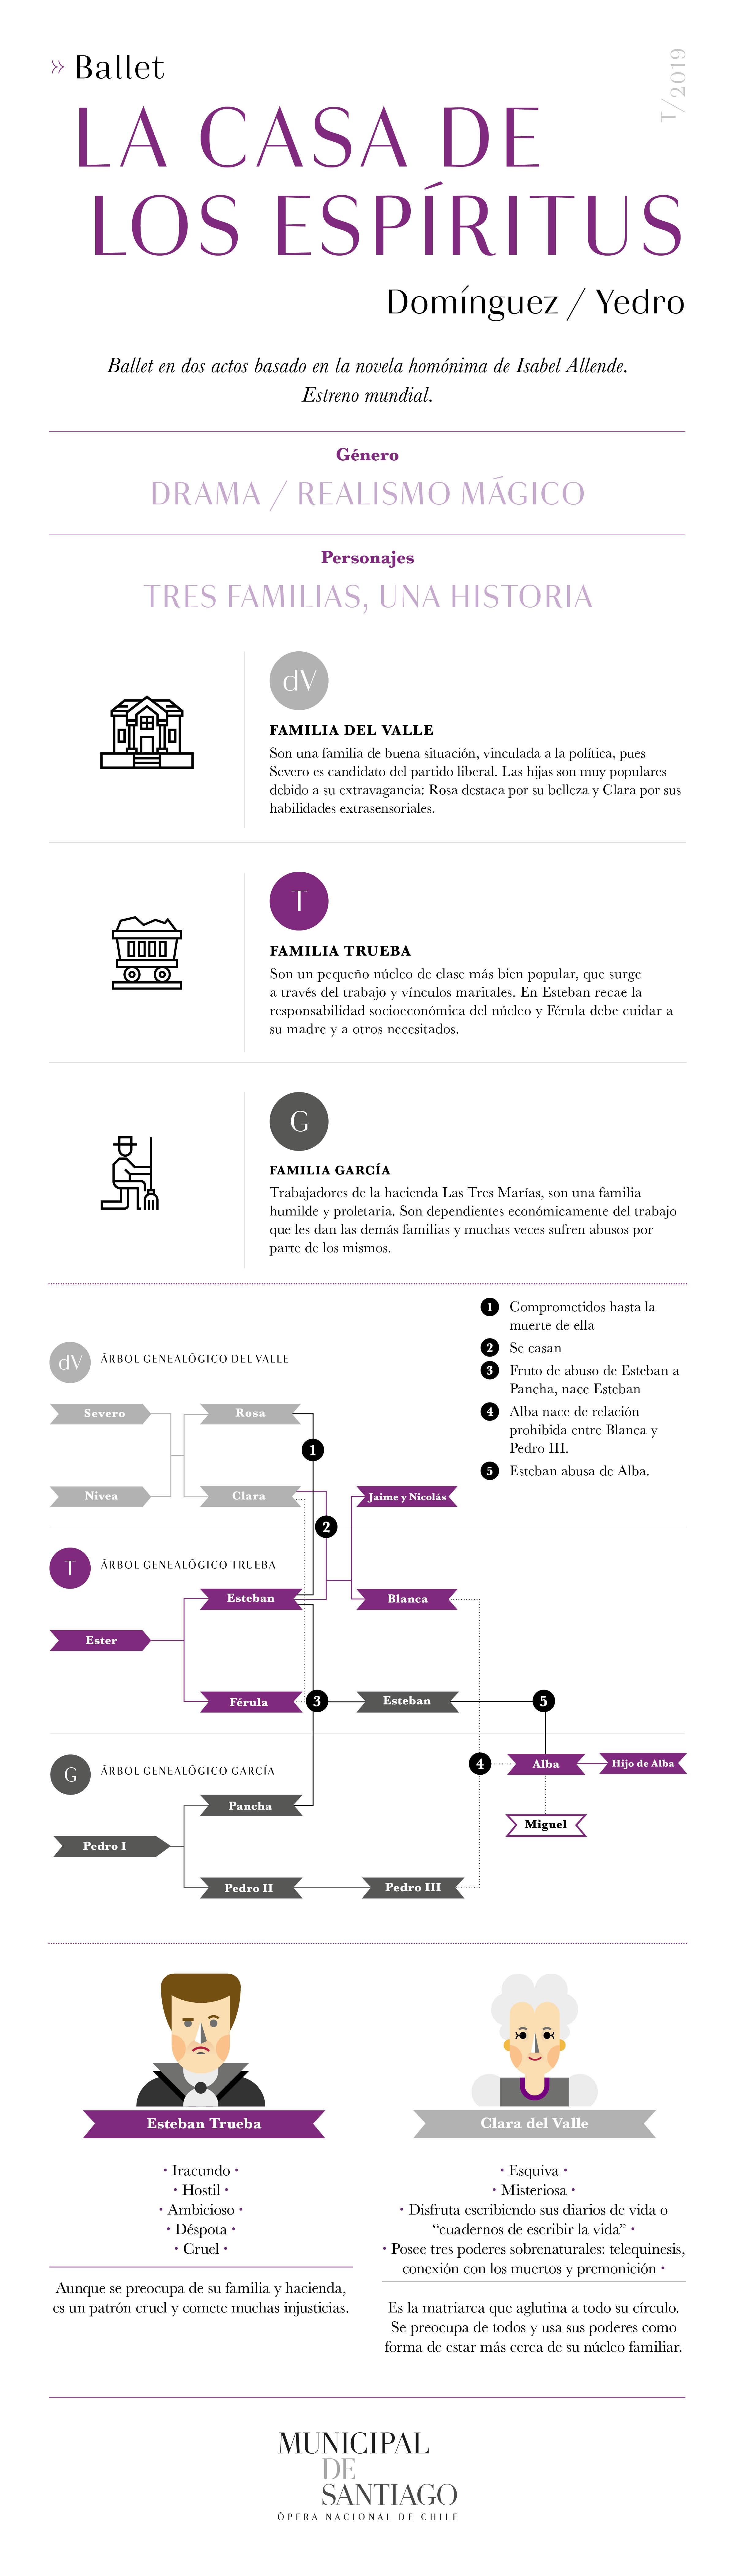 infografia la casa de los espiritus, ballet, municipal de santiago